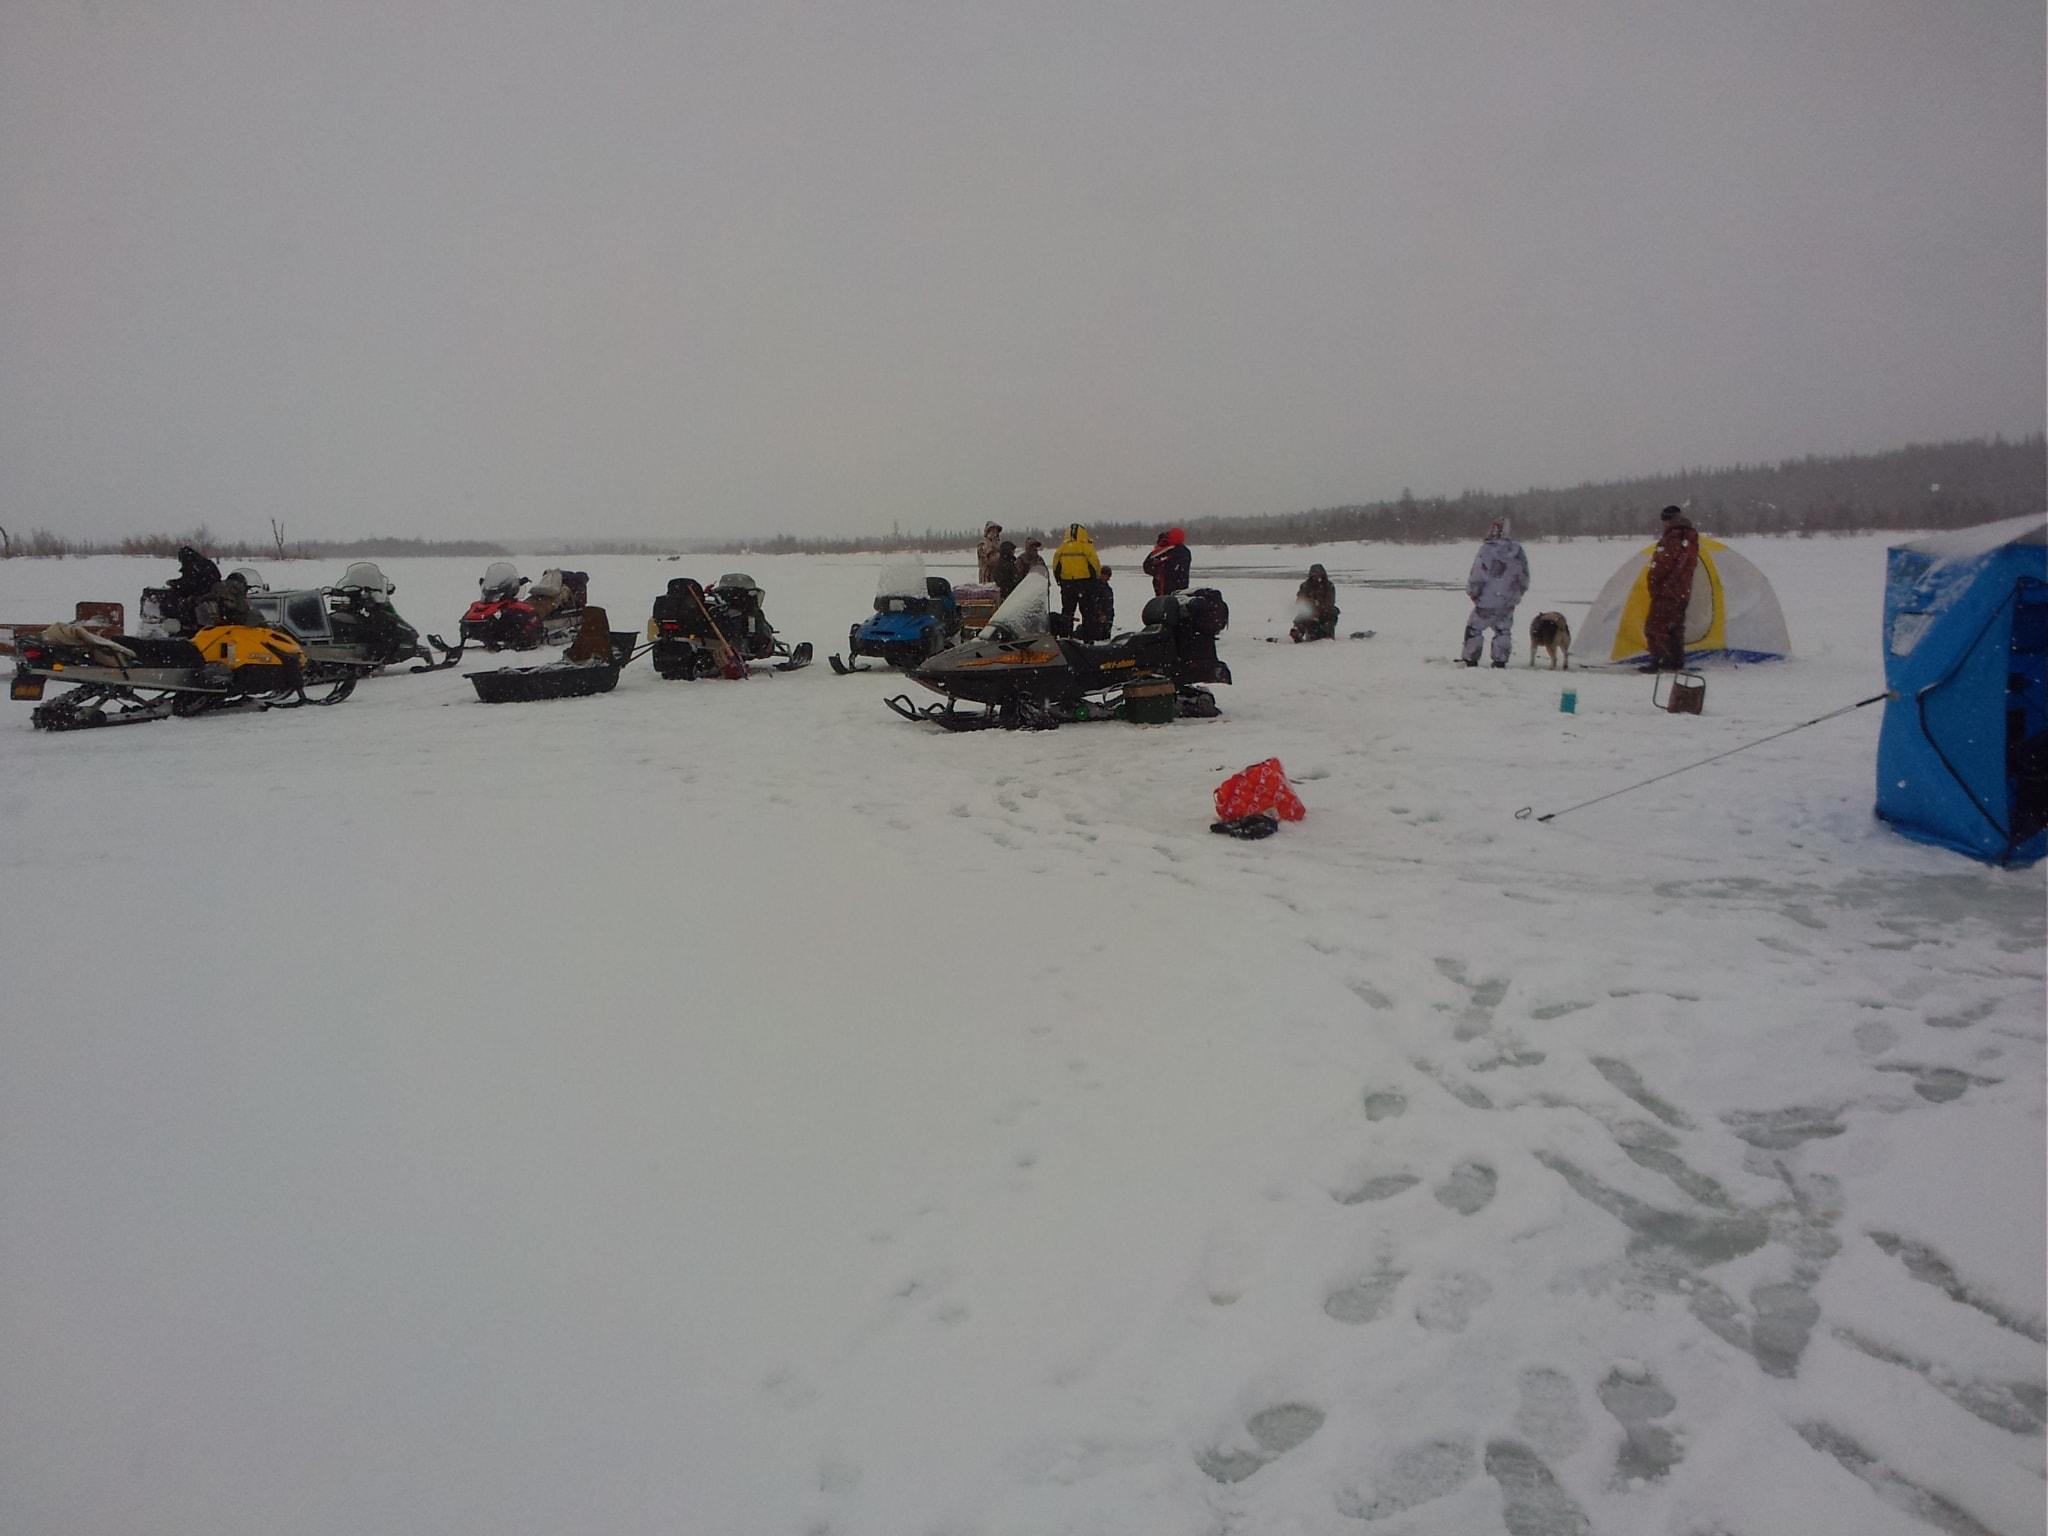 http://murman-fishing.ru/forum/download/file.php?id=87123&mode=view